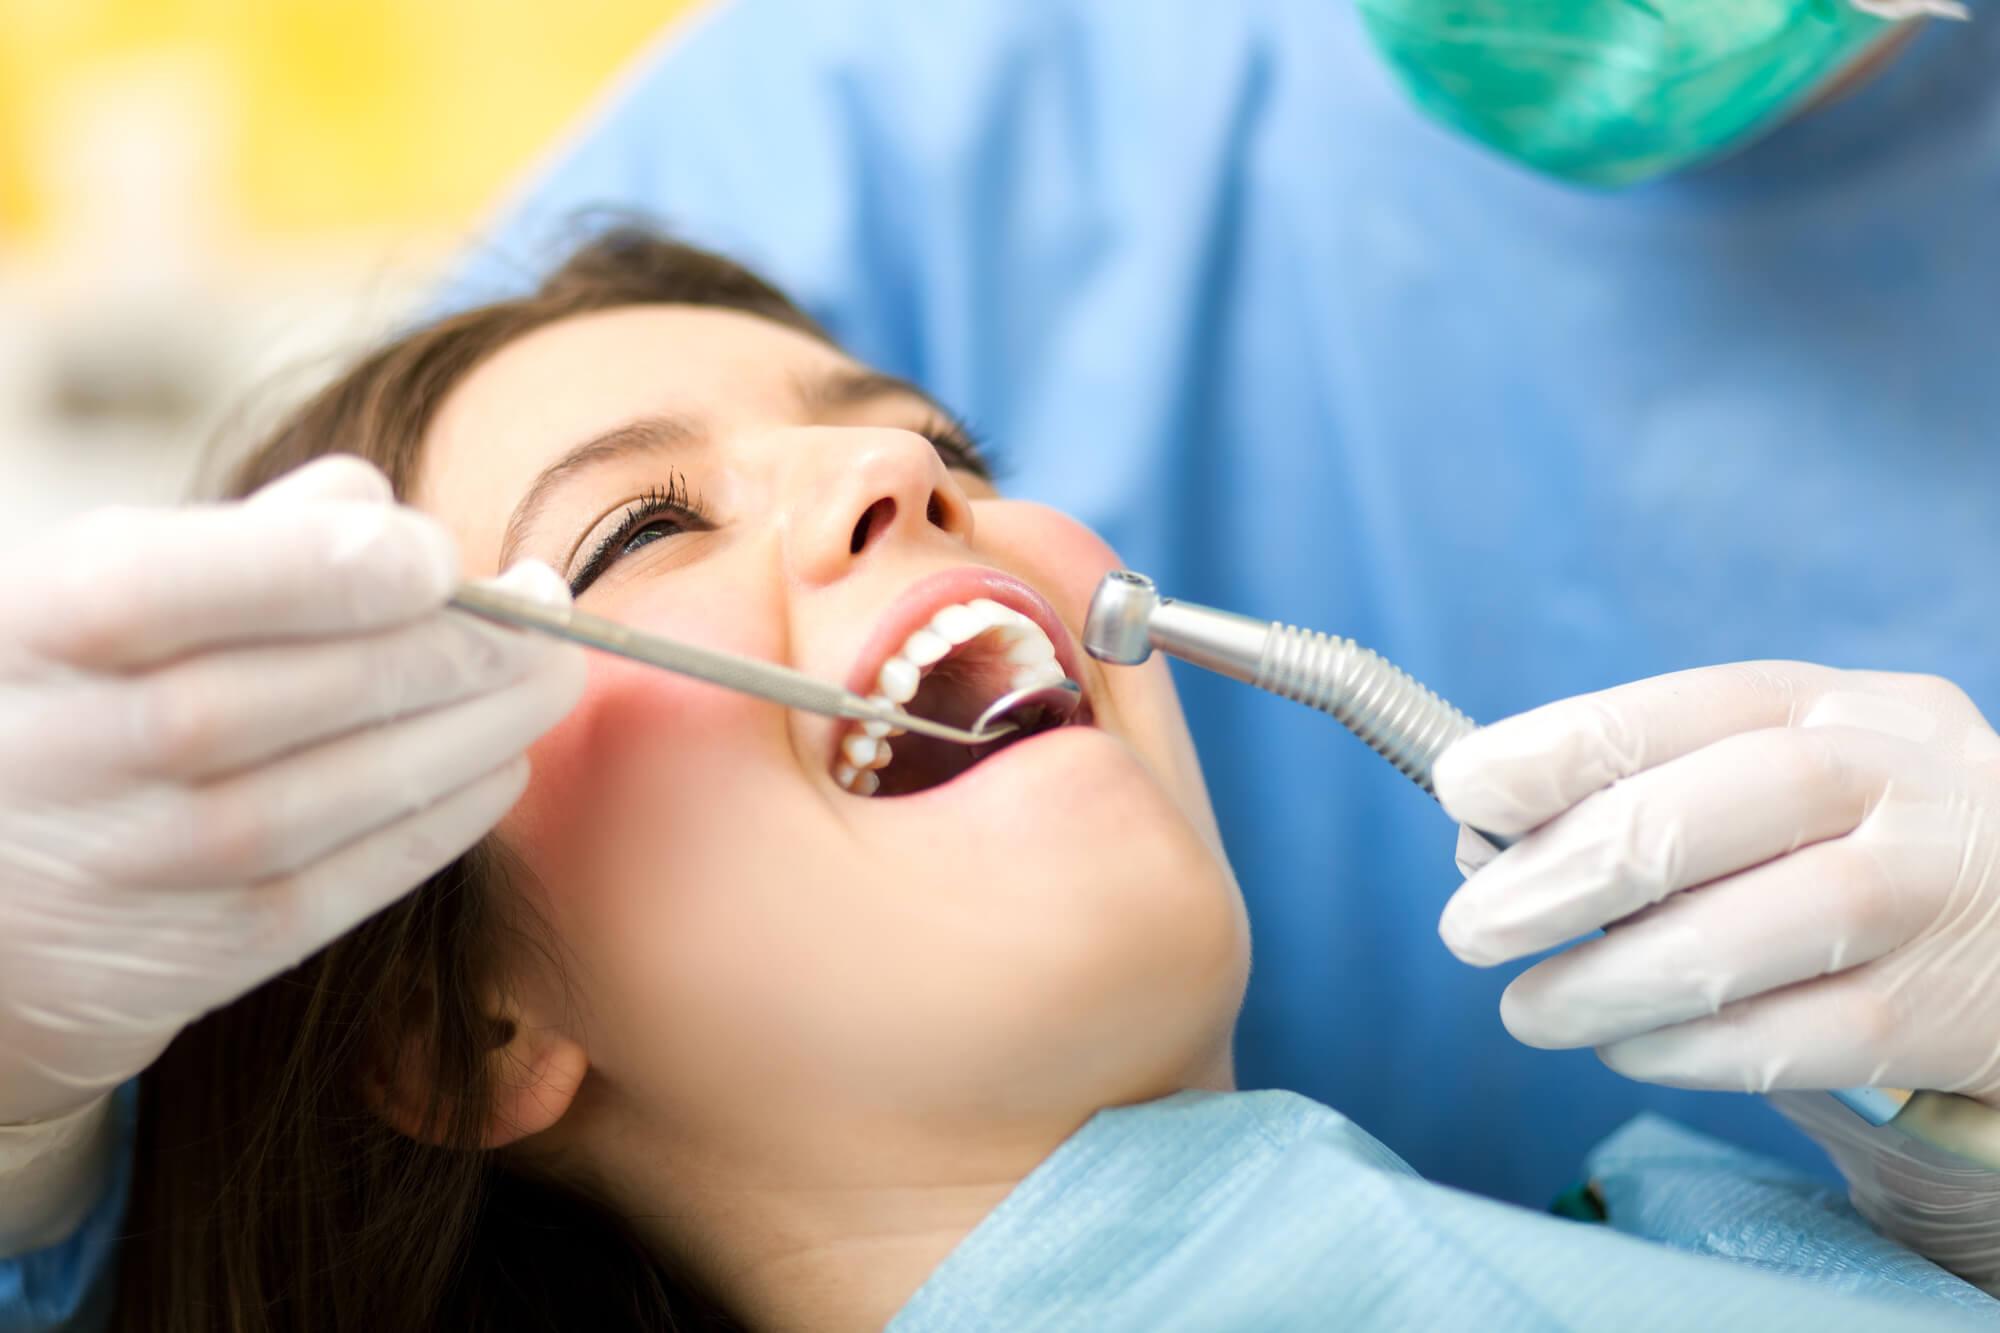 who offers dental implants orlando?